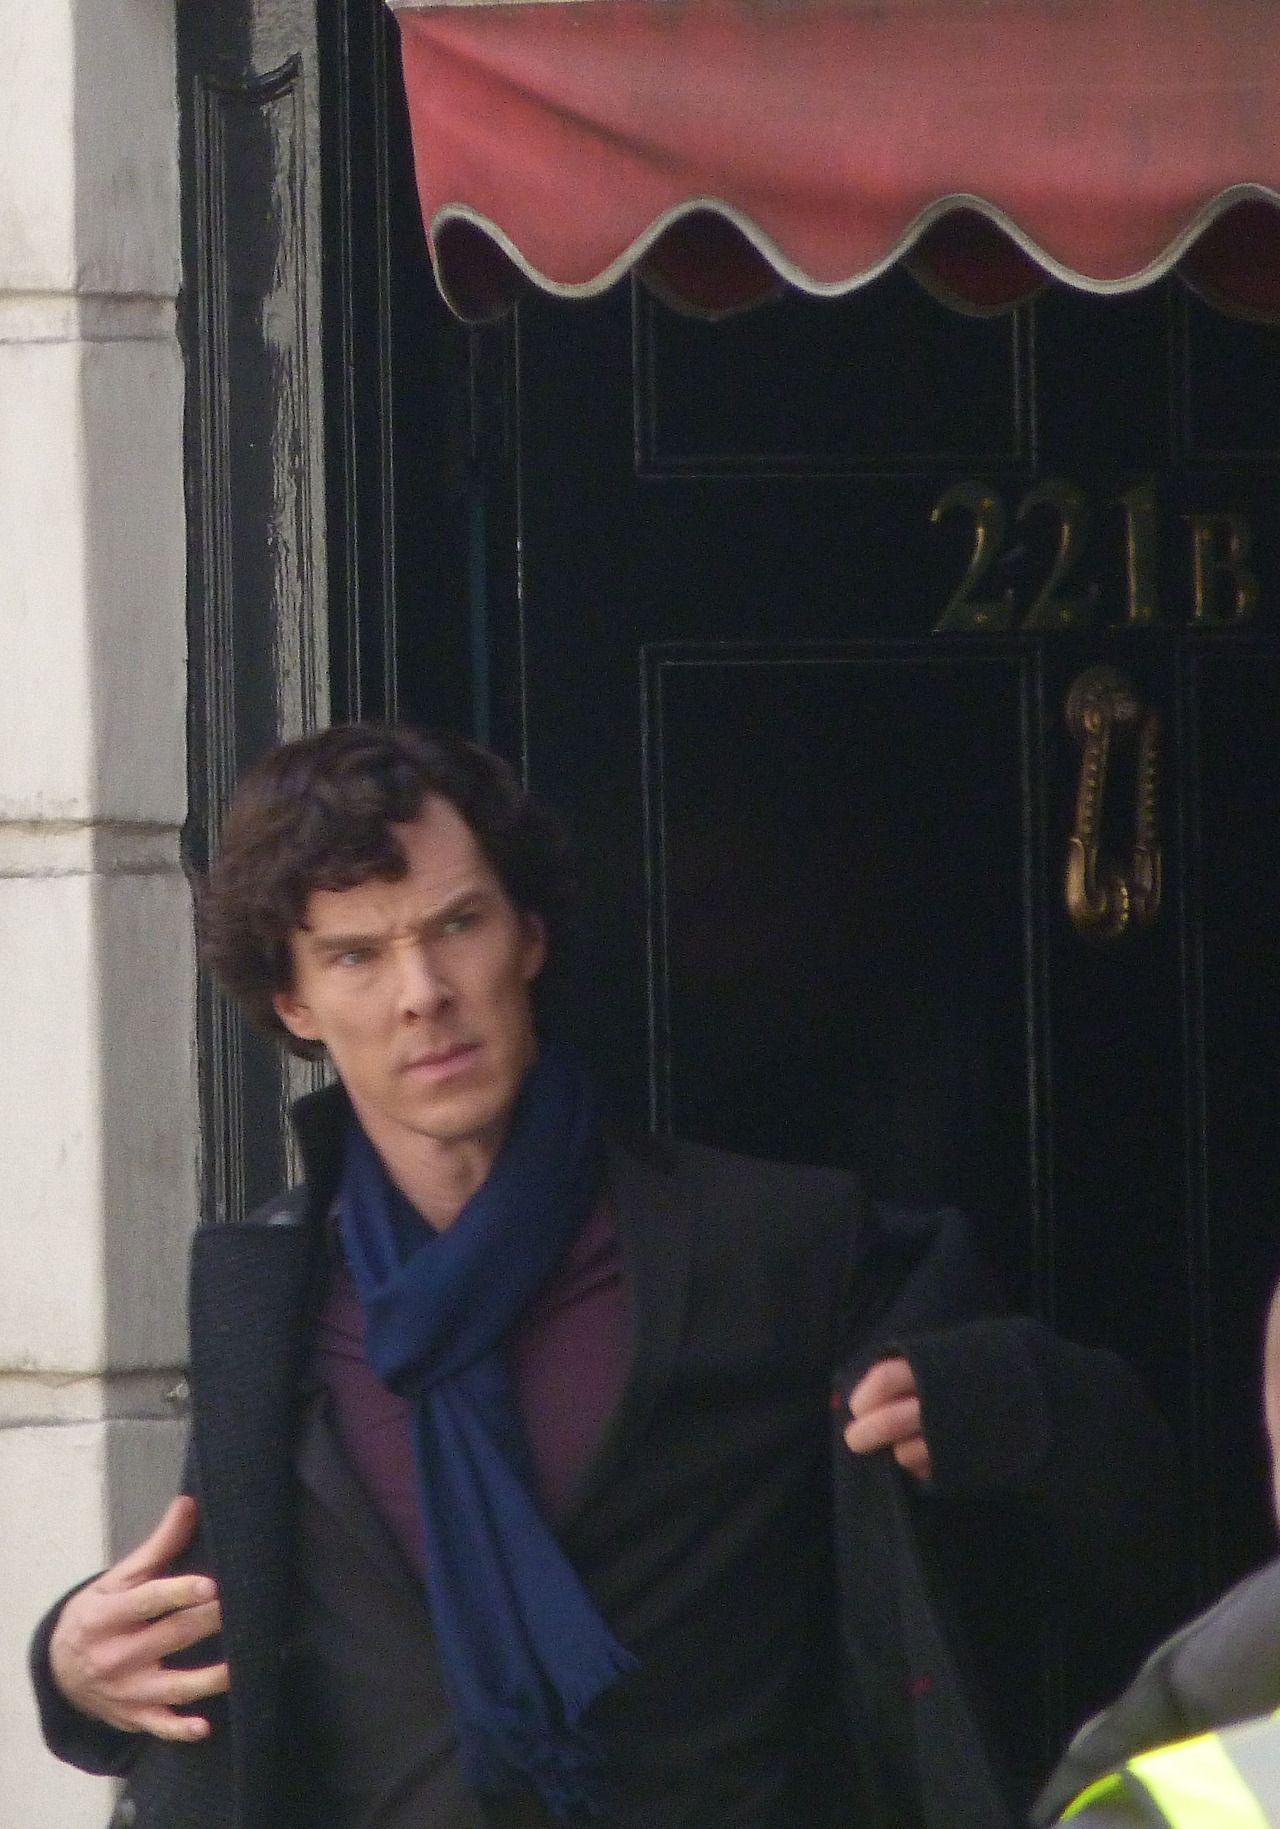 Sherlock, May 21, 2013. http://pinterest.com/aggiedem/sherlock-addict/ http://pinterest.com/aggiedem/sherbatched-or-cumberlocked/